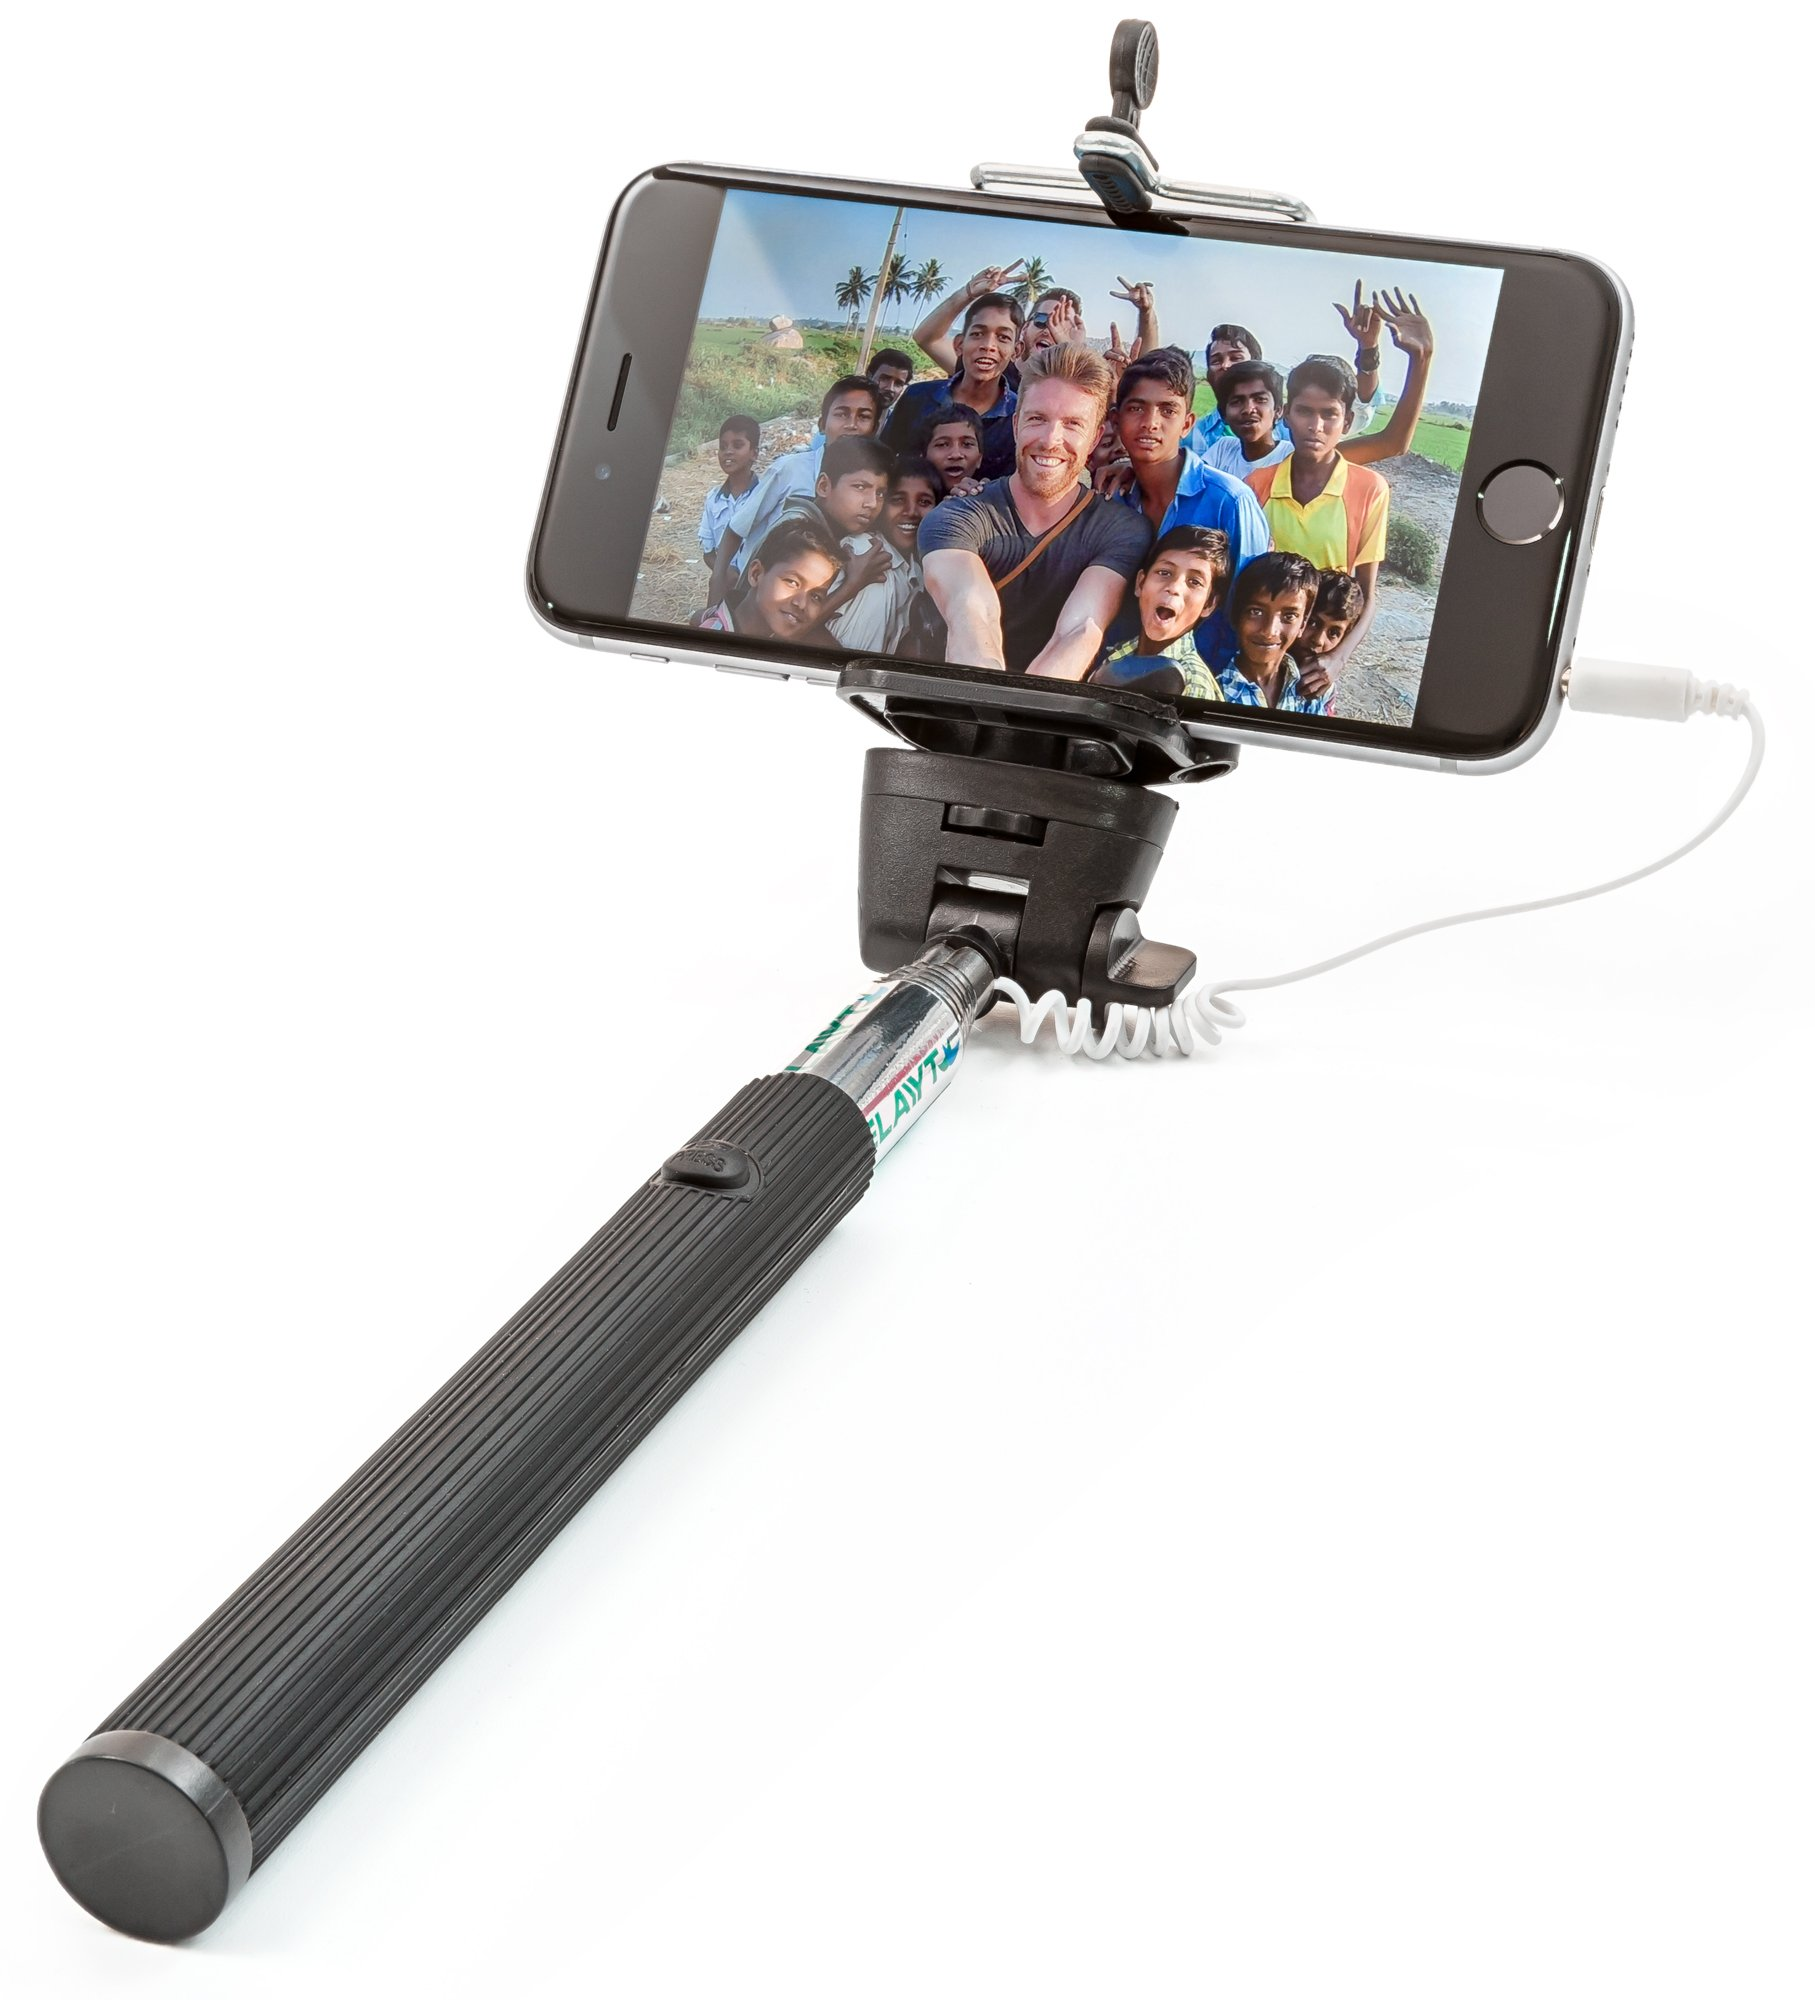 Selfie Stick Set- Sticks Perfect with GoPro iPhone X 8 8Plus 7 7Plus 6 6Plus 5 5s 5c 4 Samsung Galaxy 8 s8 Plus s7 Edge 6 s6 5 4 4s Cellphone & Camera eg Canon DSLR Sony Nikon-Black by Elayyt